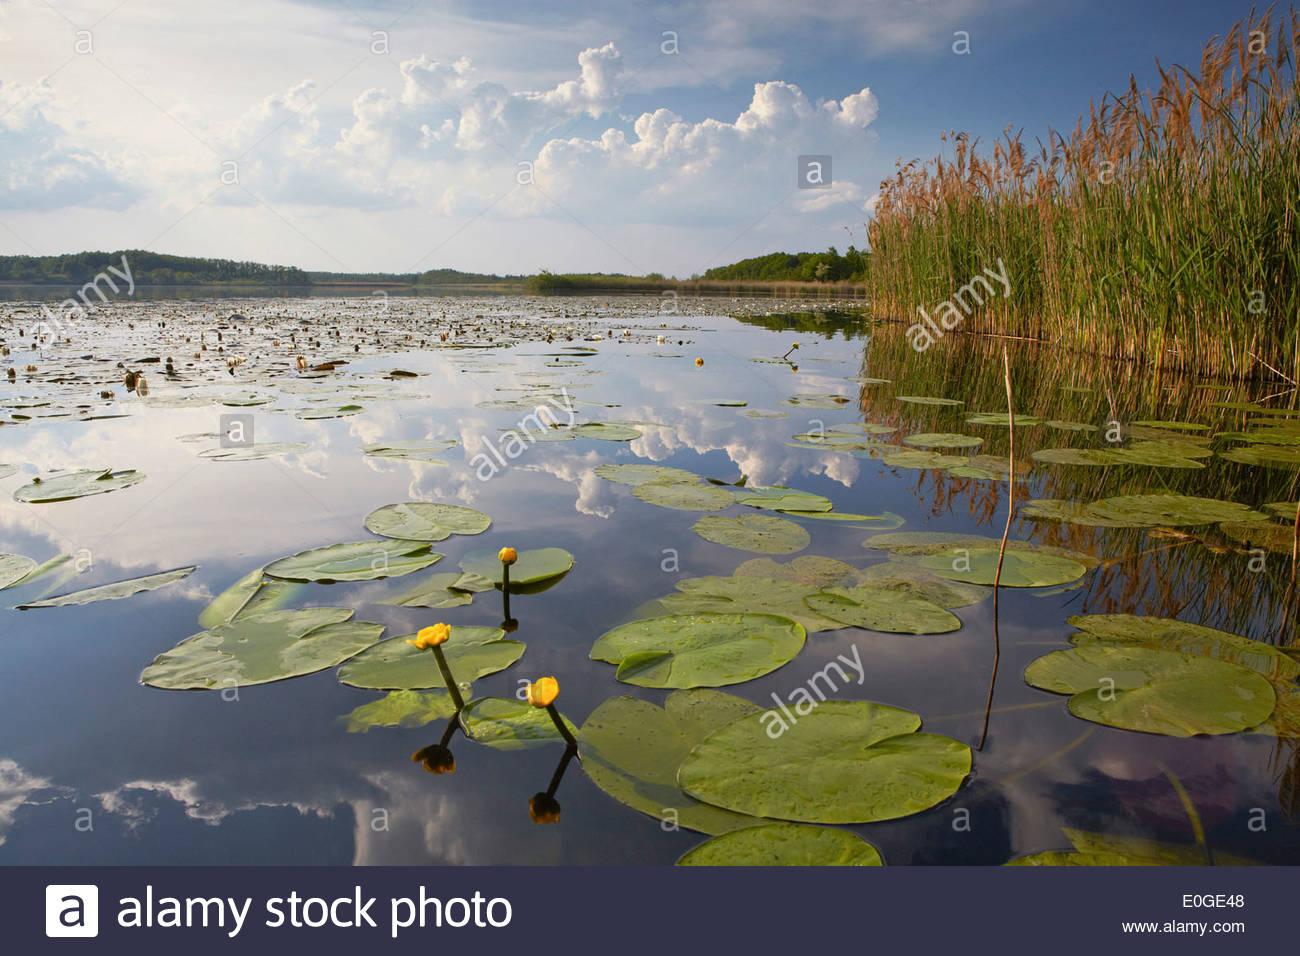 Water lilies on the surface of Gross Schauener Lake, Sielmann Naturlandschaft, Brandenburg, Germany - Stock Image